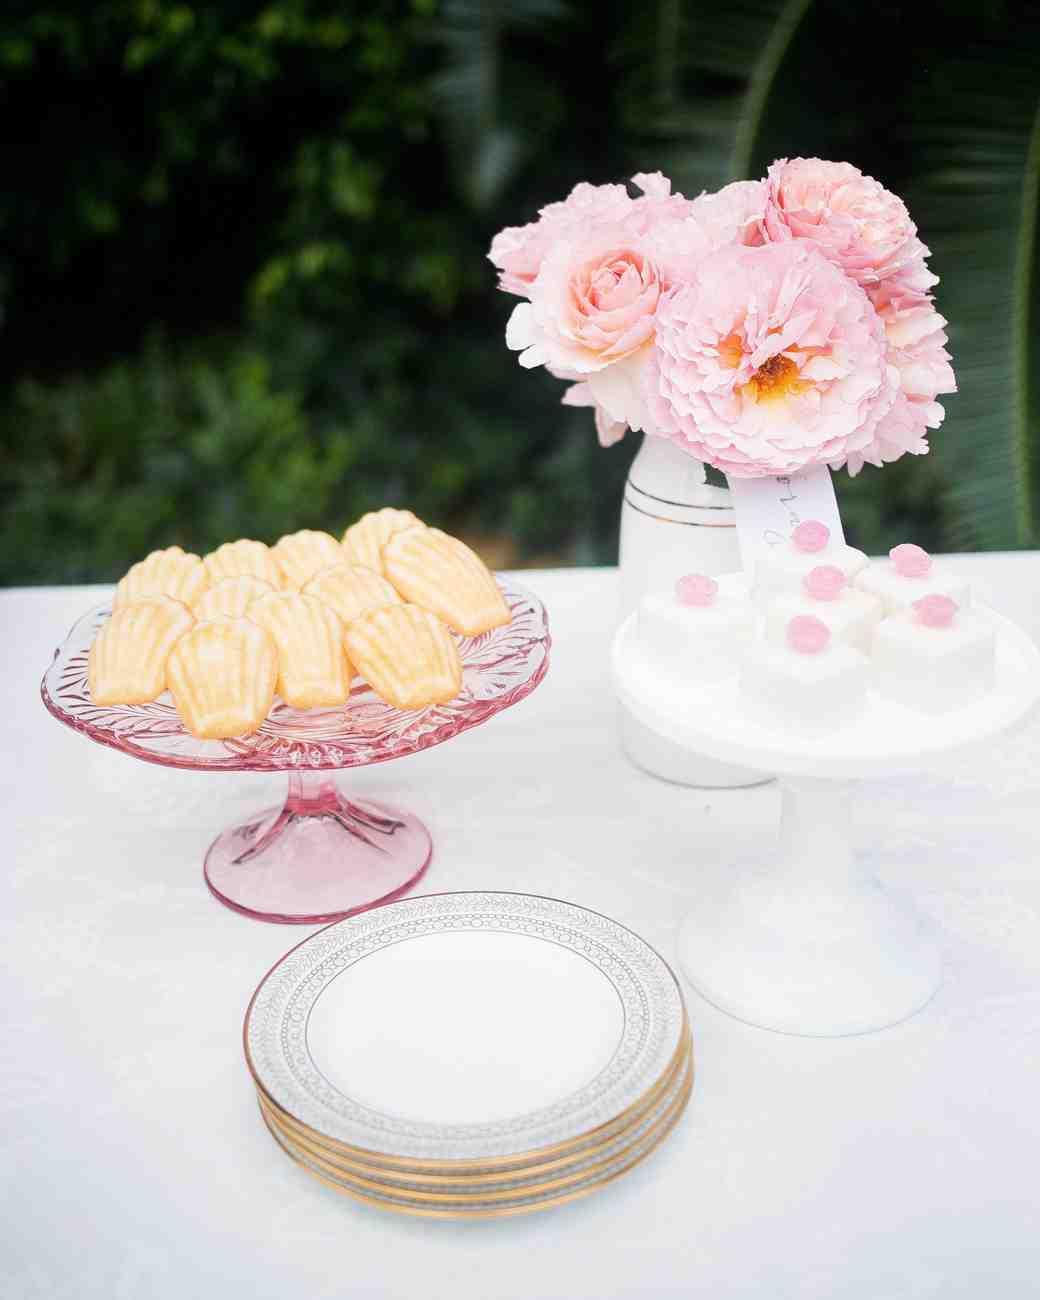 fashionable-hostess-bridal-shower-desserts-0716.jpg